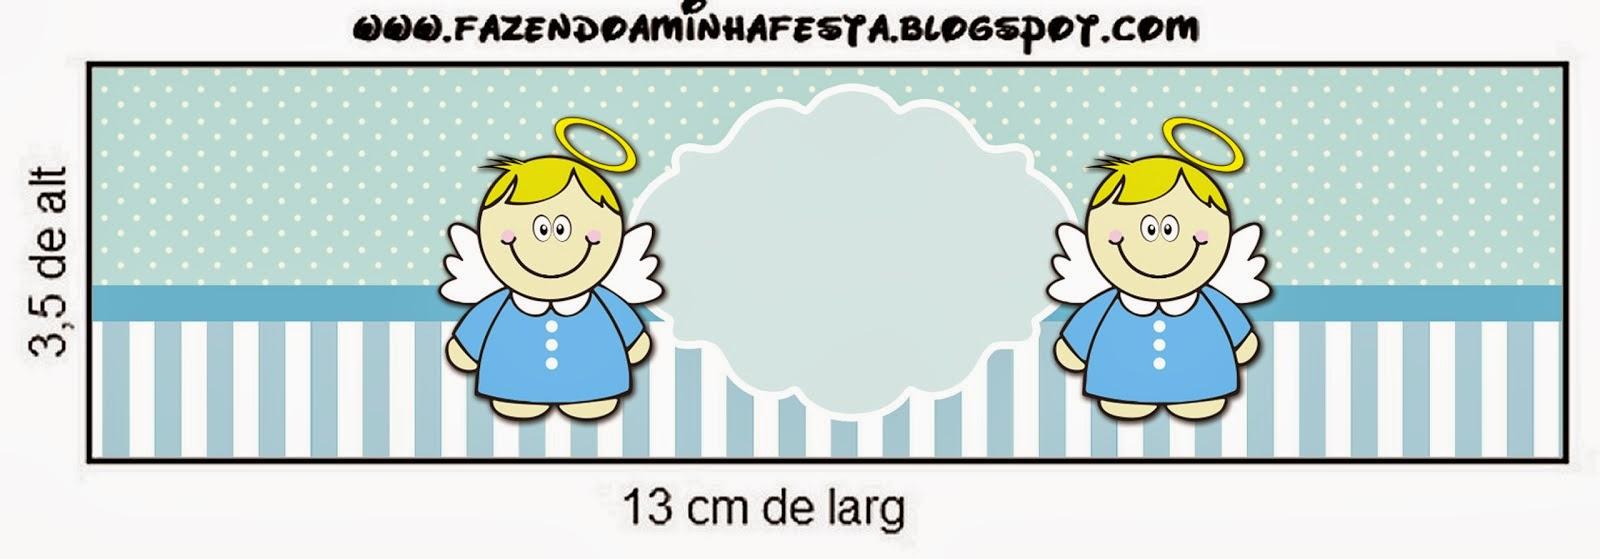 Bautismo Angelito Rubio Etiquetas para Candy Bar para Imprimir